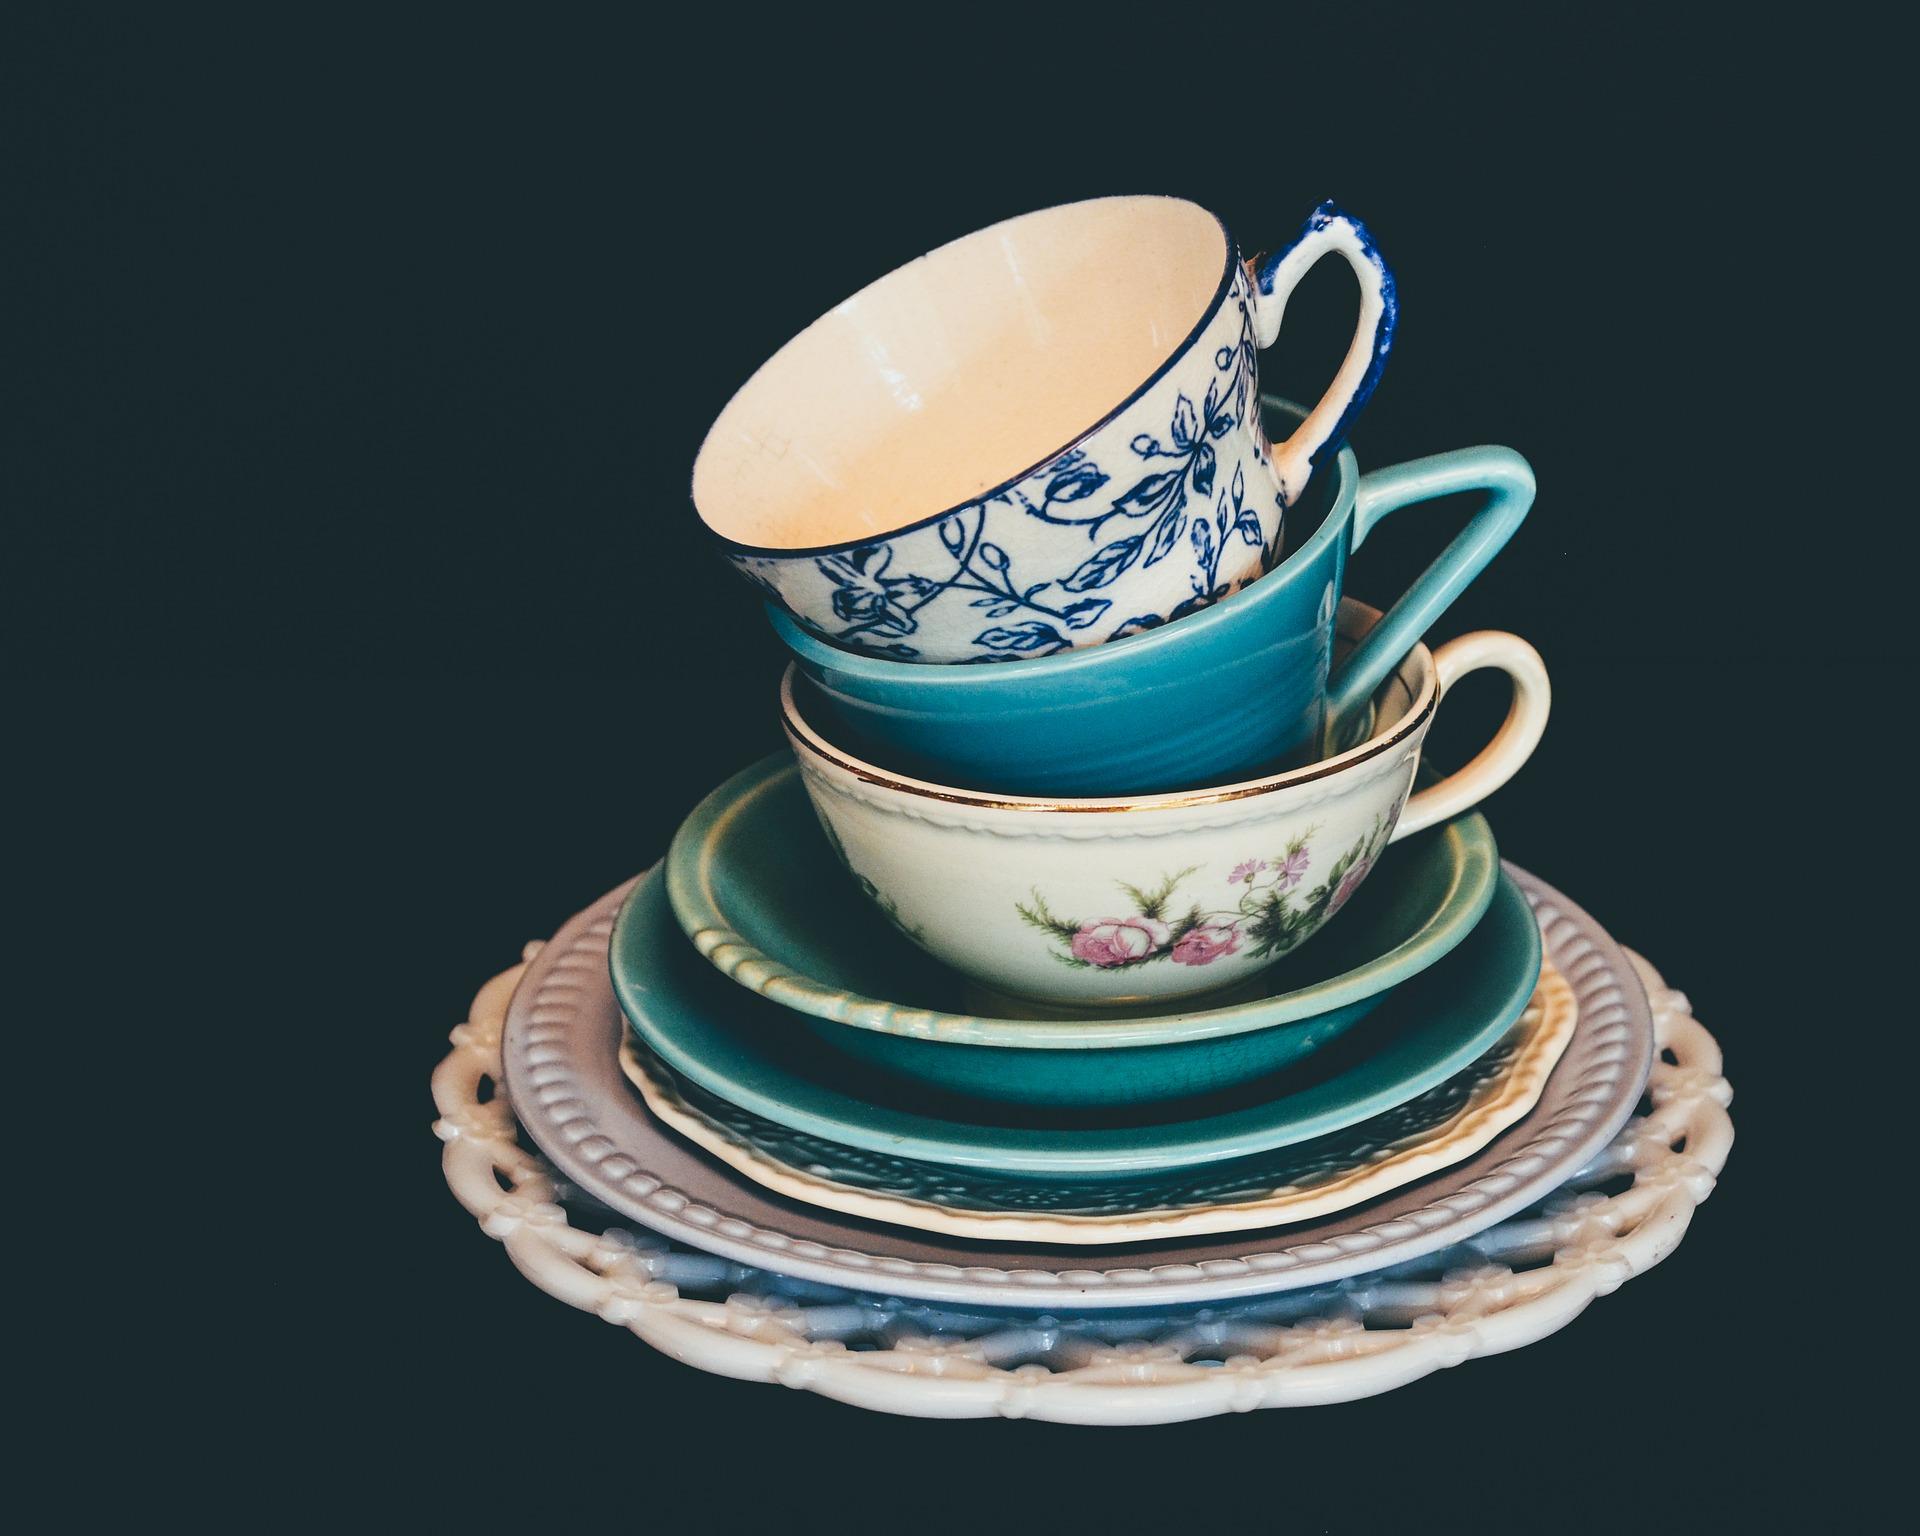 Ein bunter Stapel eleganter Teetassen.